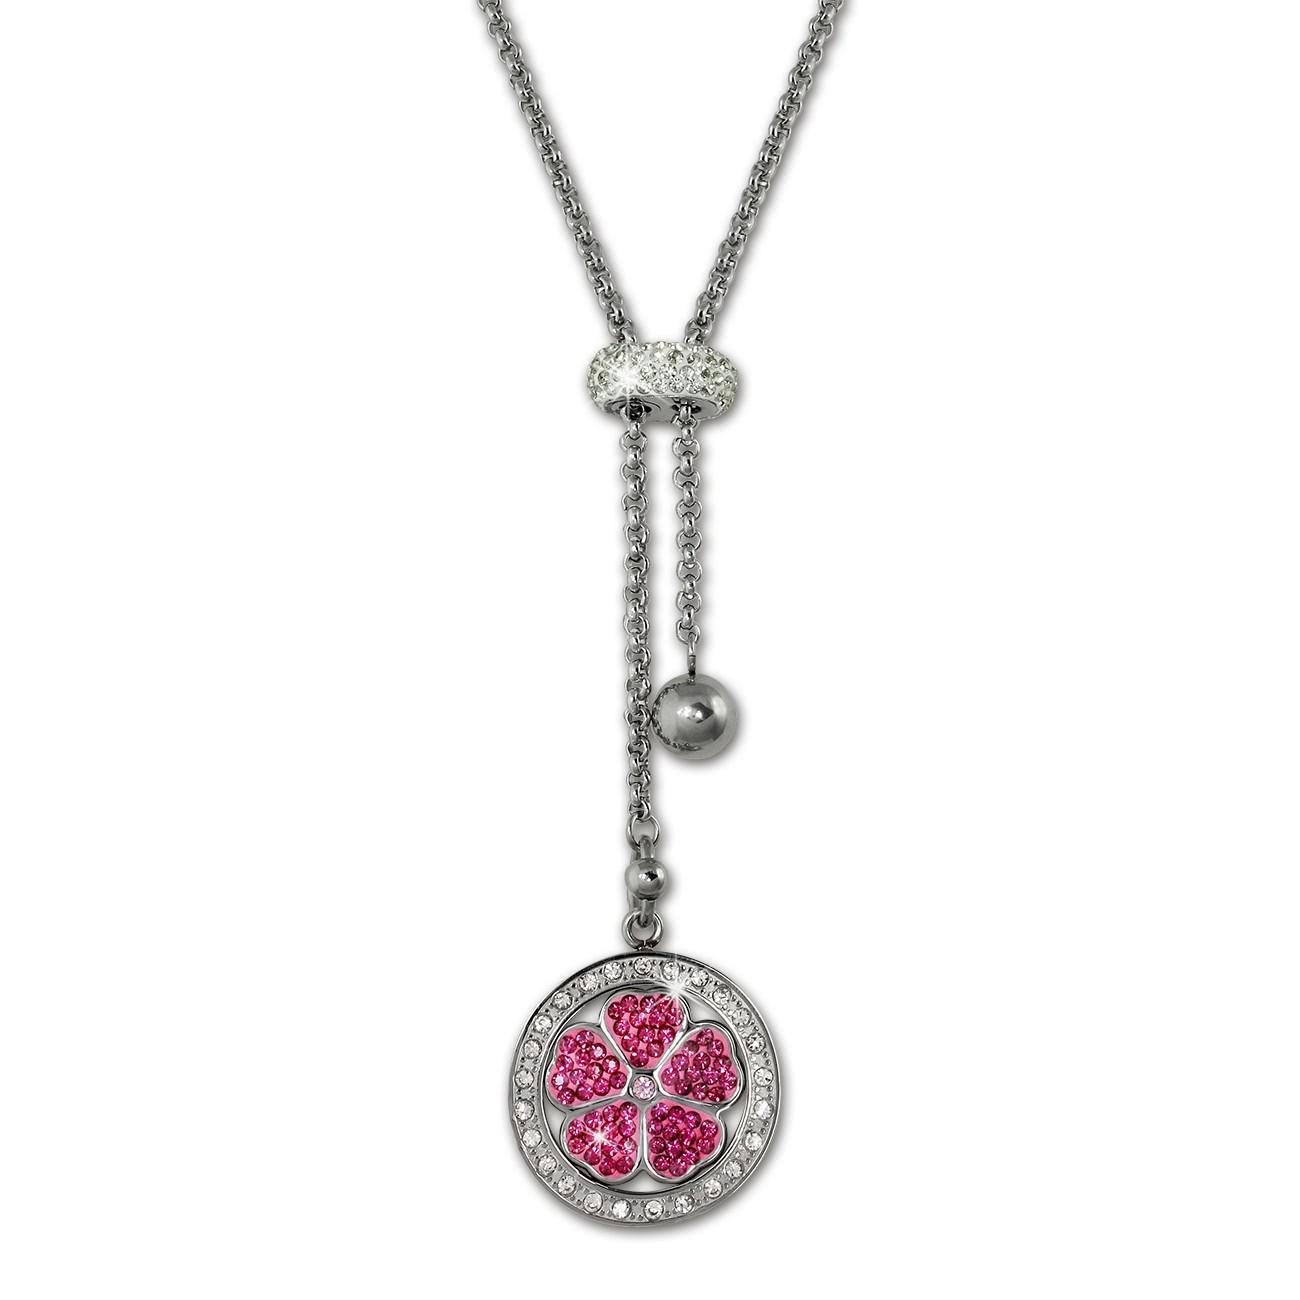 Amello Halskette Kleeblatt pink Damen Edelstahlschmuck ESKQ02P